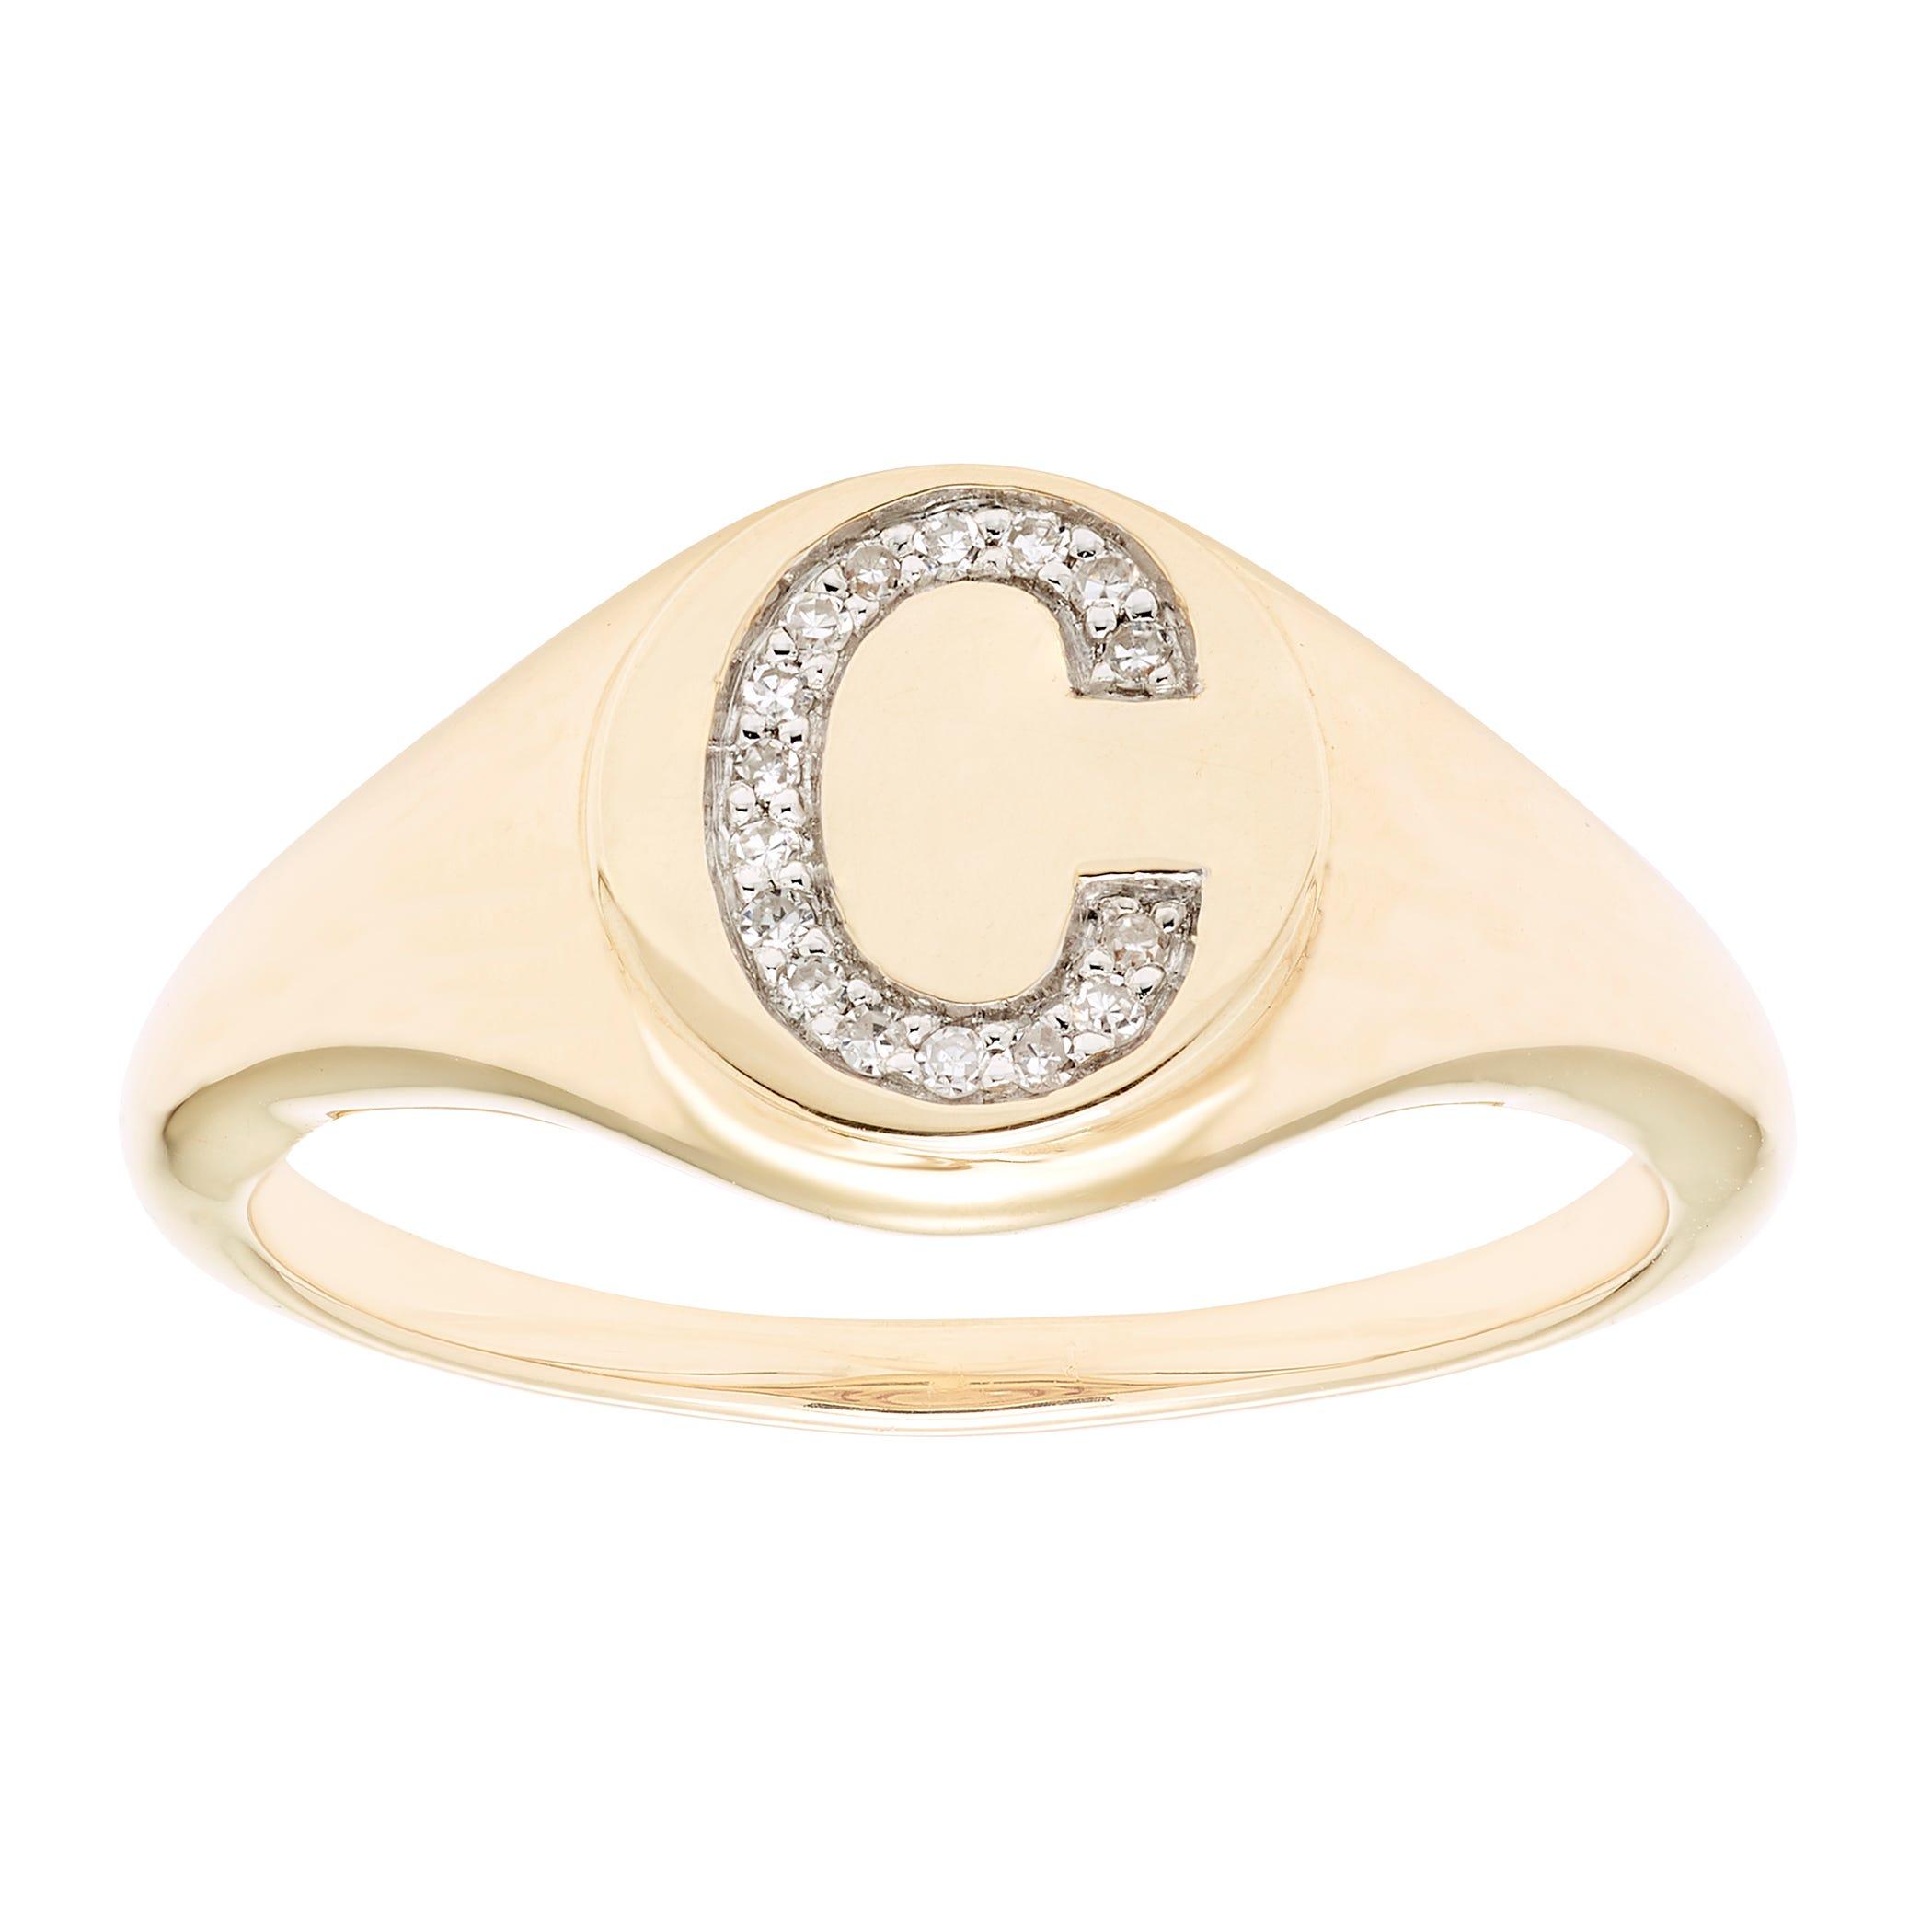 Diamond Initial C Signet Ring in 14k Yellow Gold